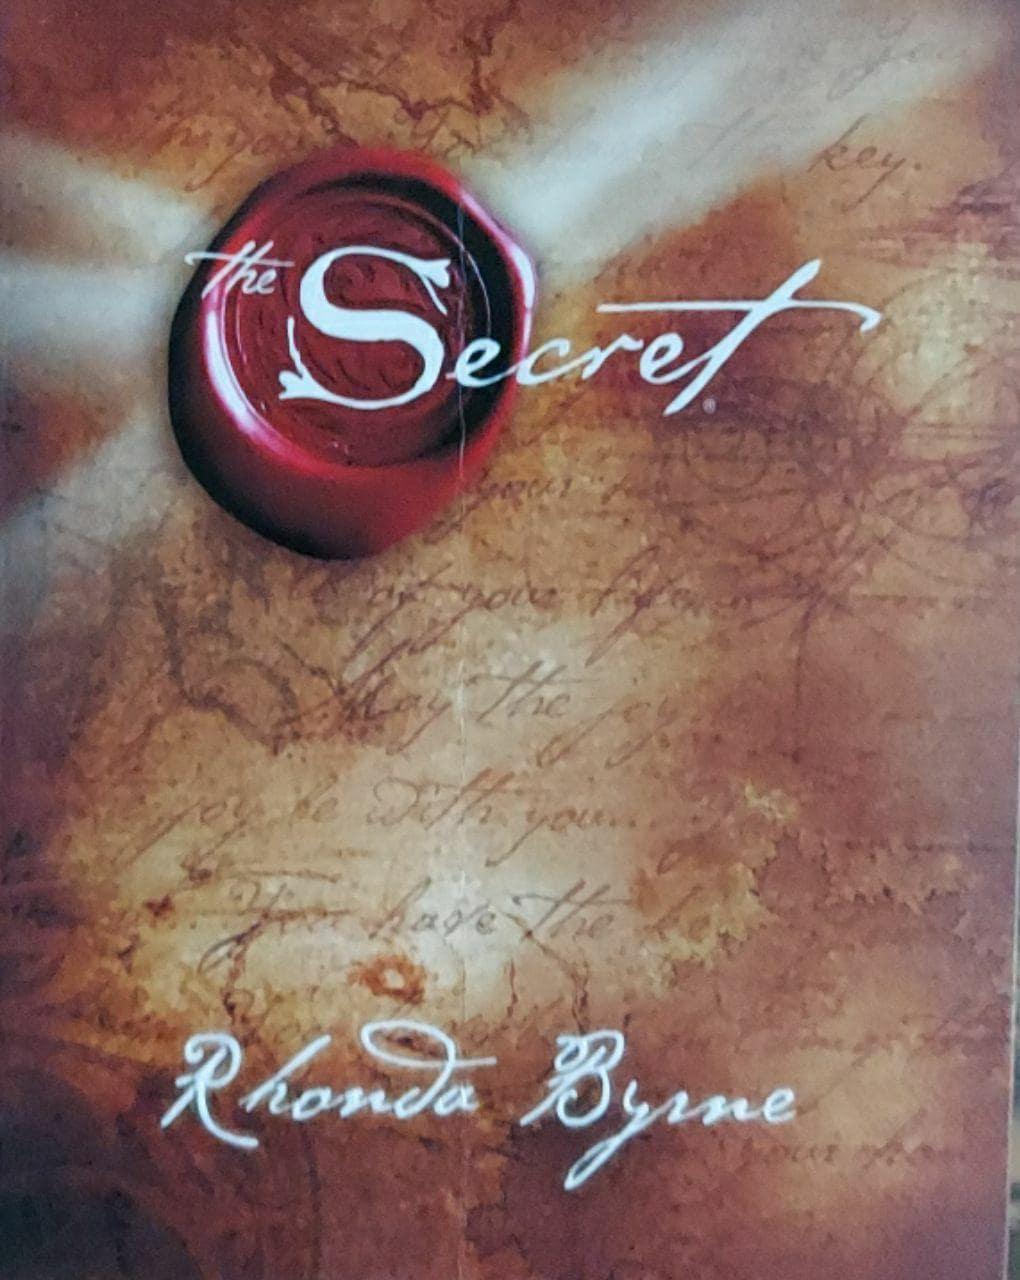 THE SECRET, Rhonda Byrne